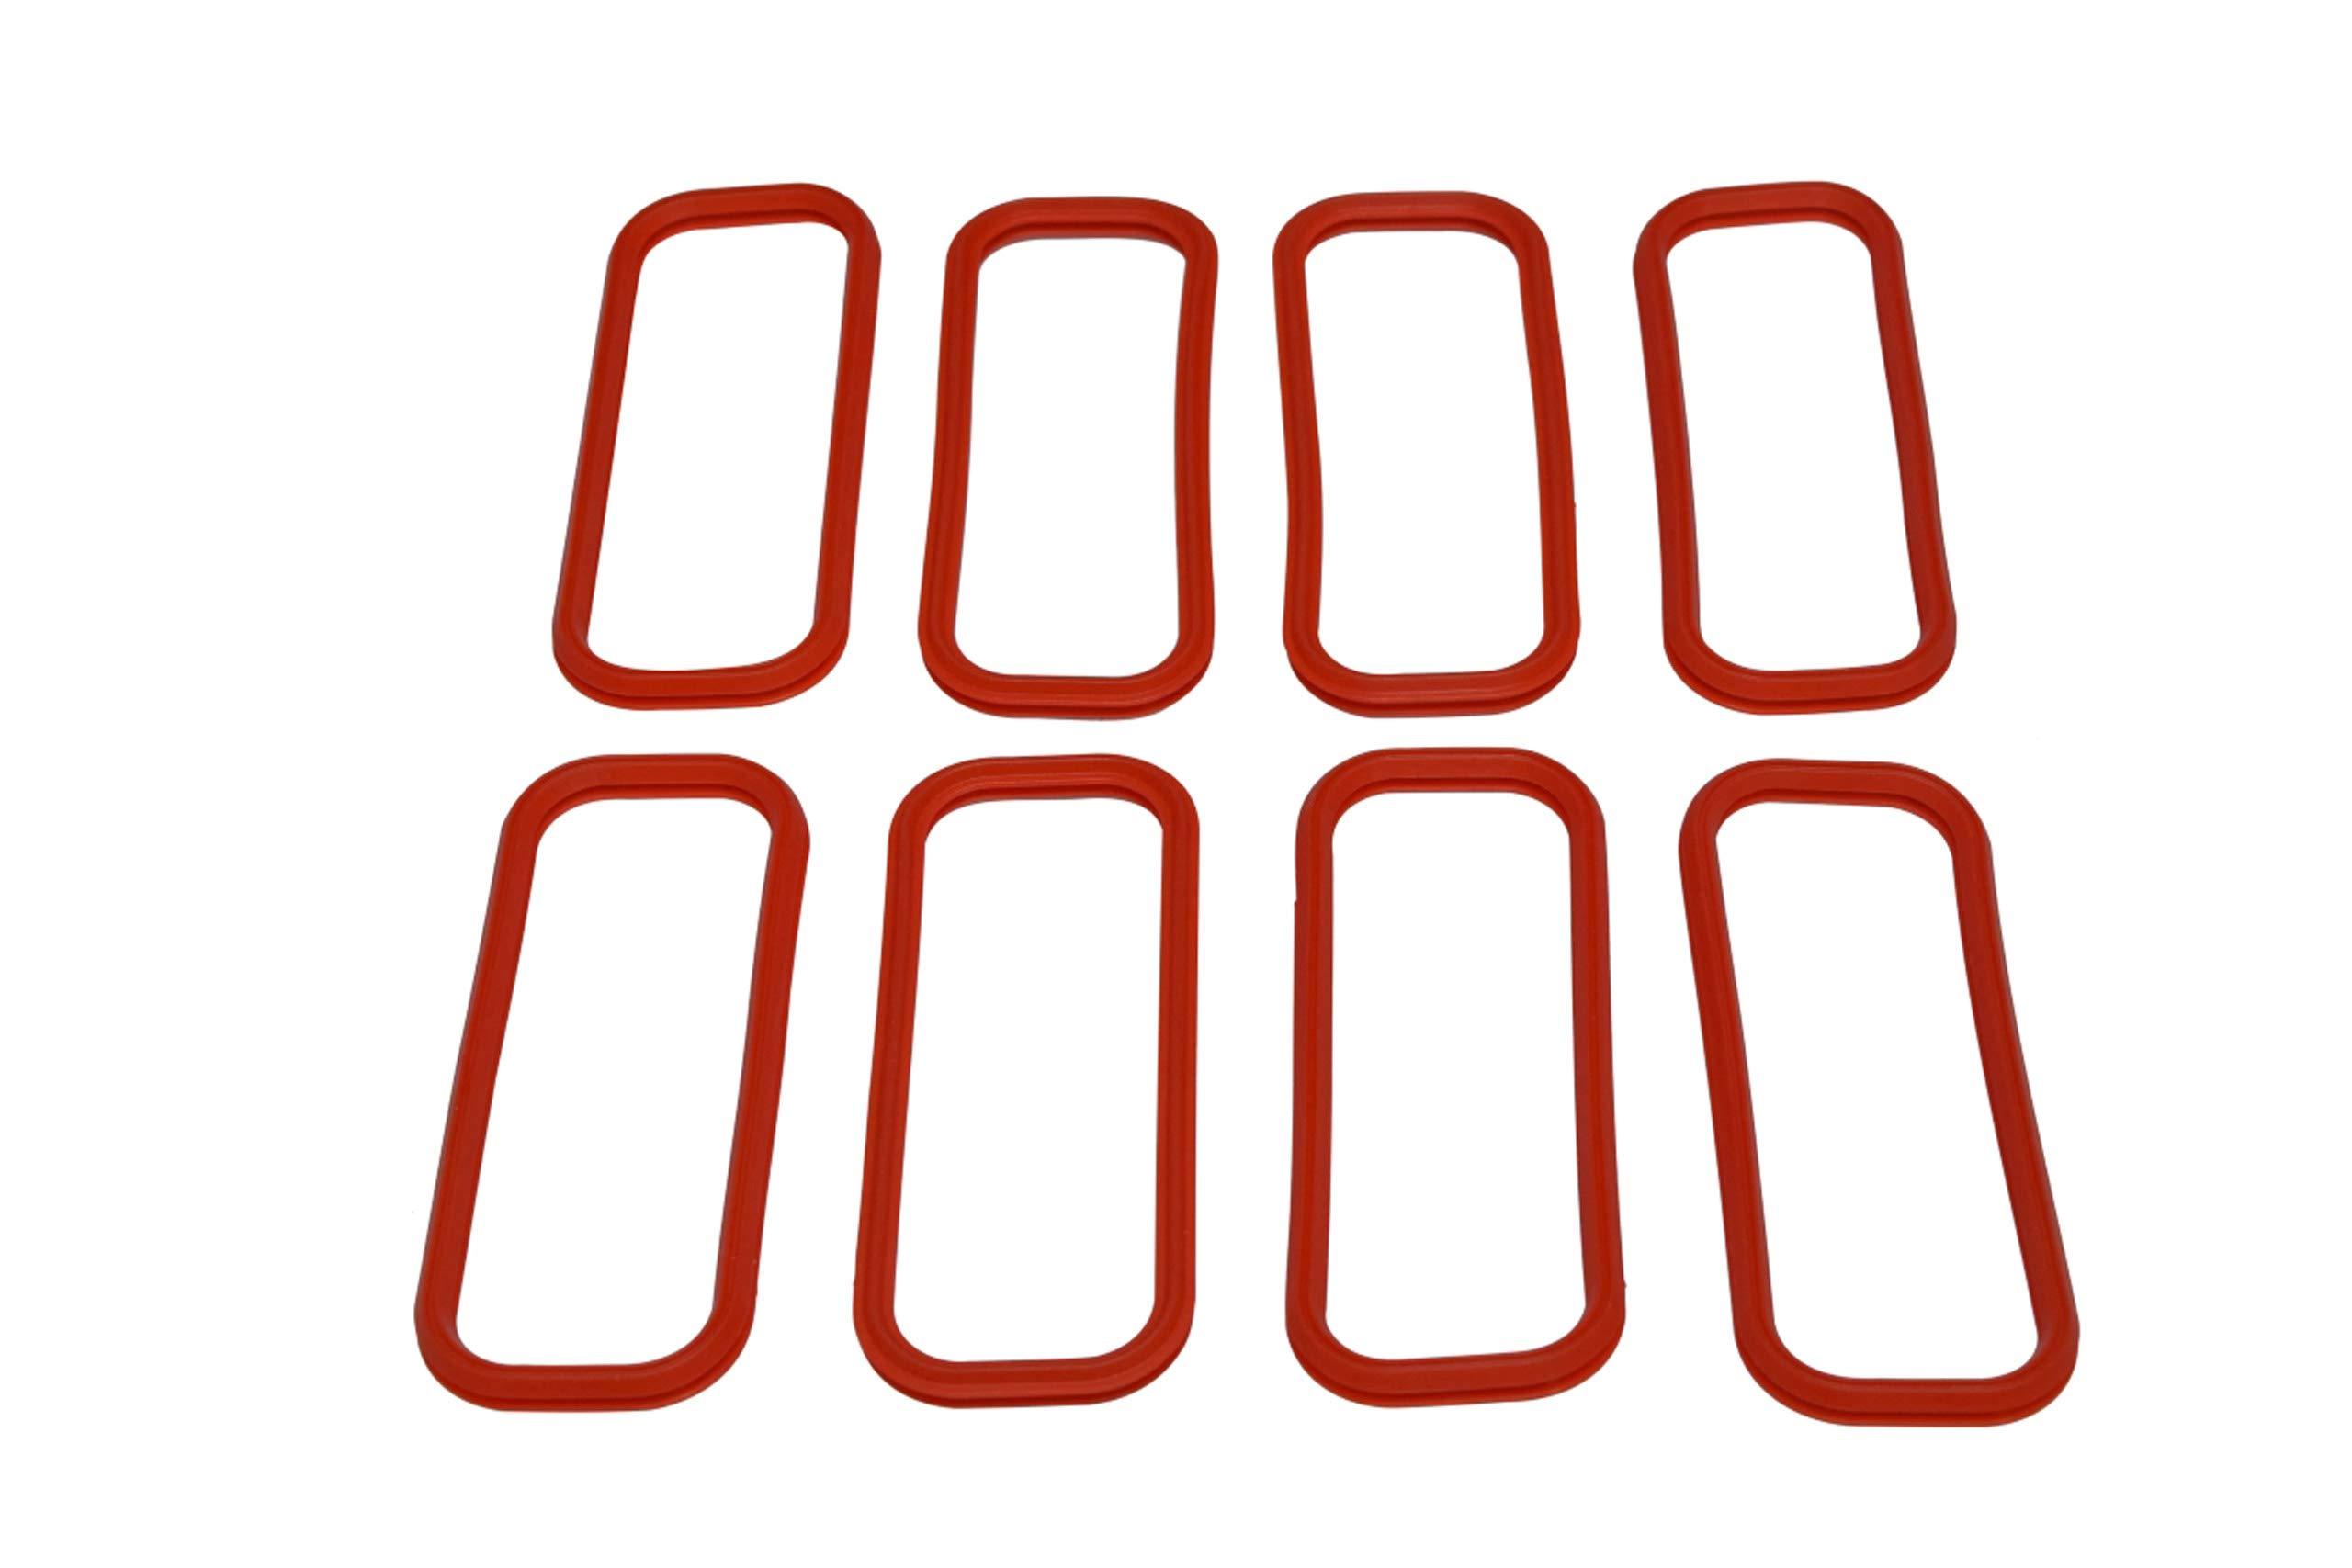 LS Intake Manifold Lower Seal O-Ring Gasket Set Fit for LS1 LS6 Fast LSX Camaro Corvette GTO Intake Manifold Gasket Set